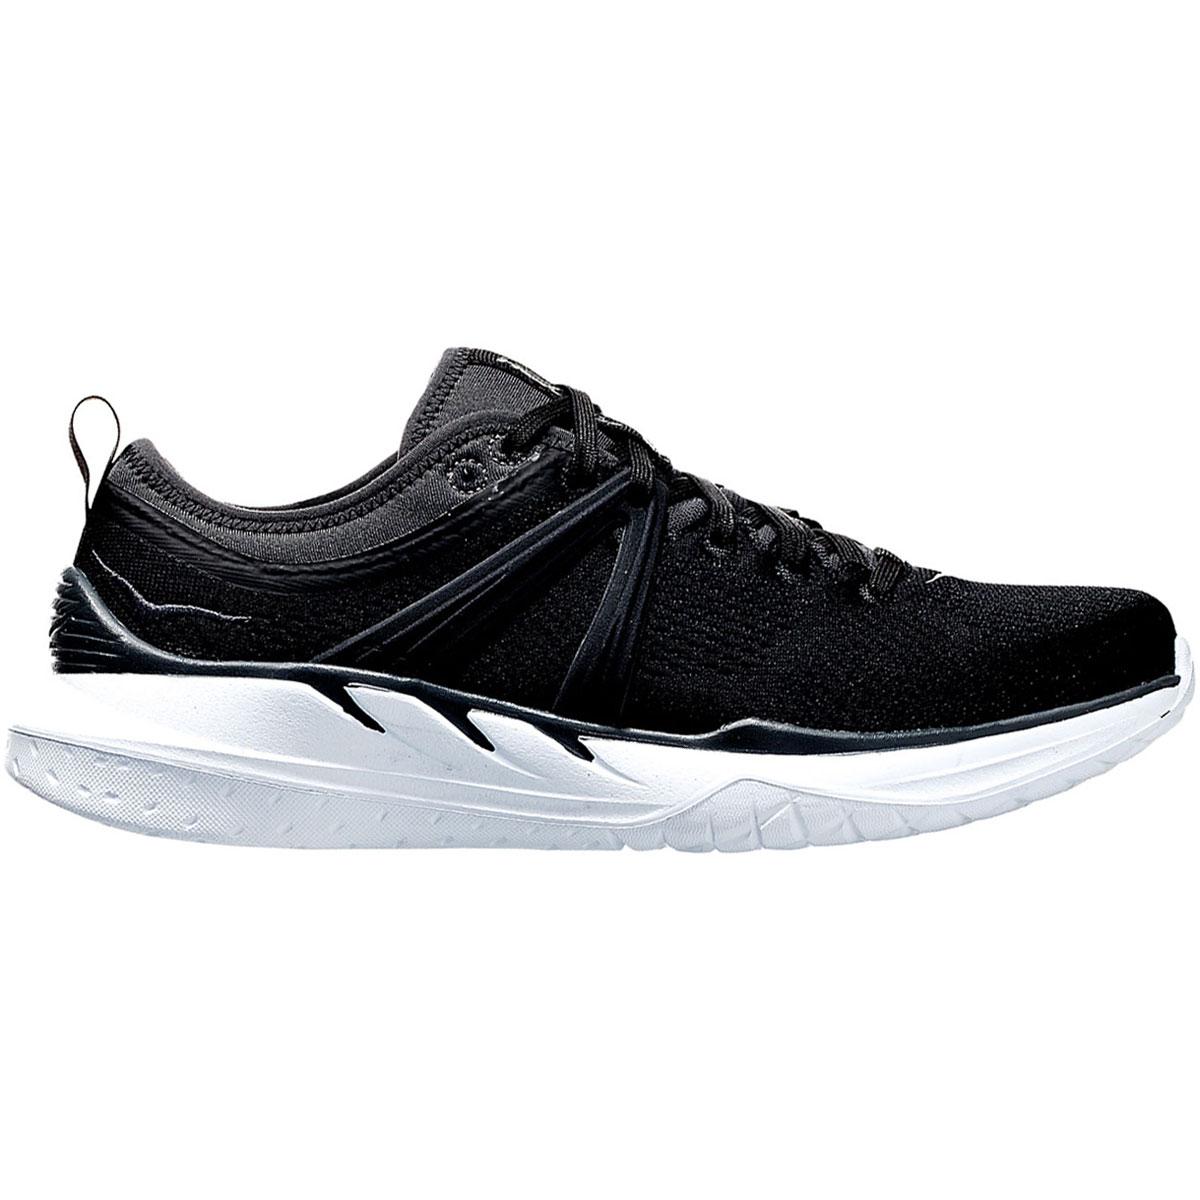 Women's Hoka One One Tivra Running Shoe - Color: Black/Dark Shadow - Size: 5 - Width: Regular, Black/Dark Shadow, large, image 3